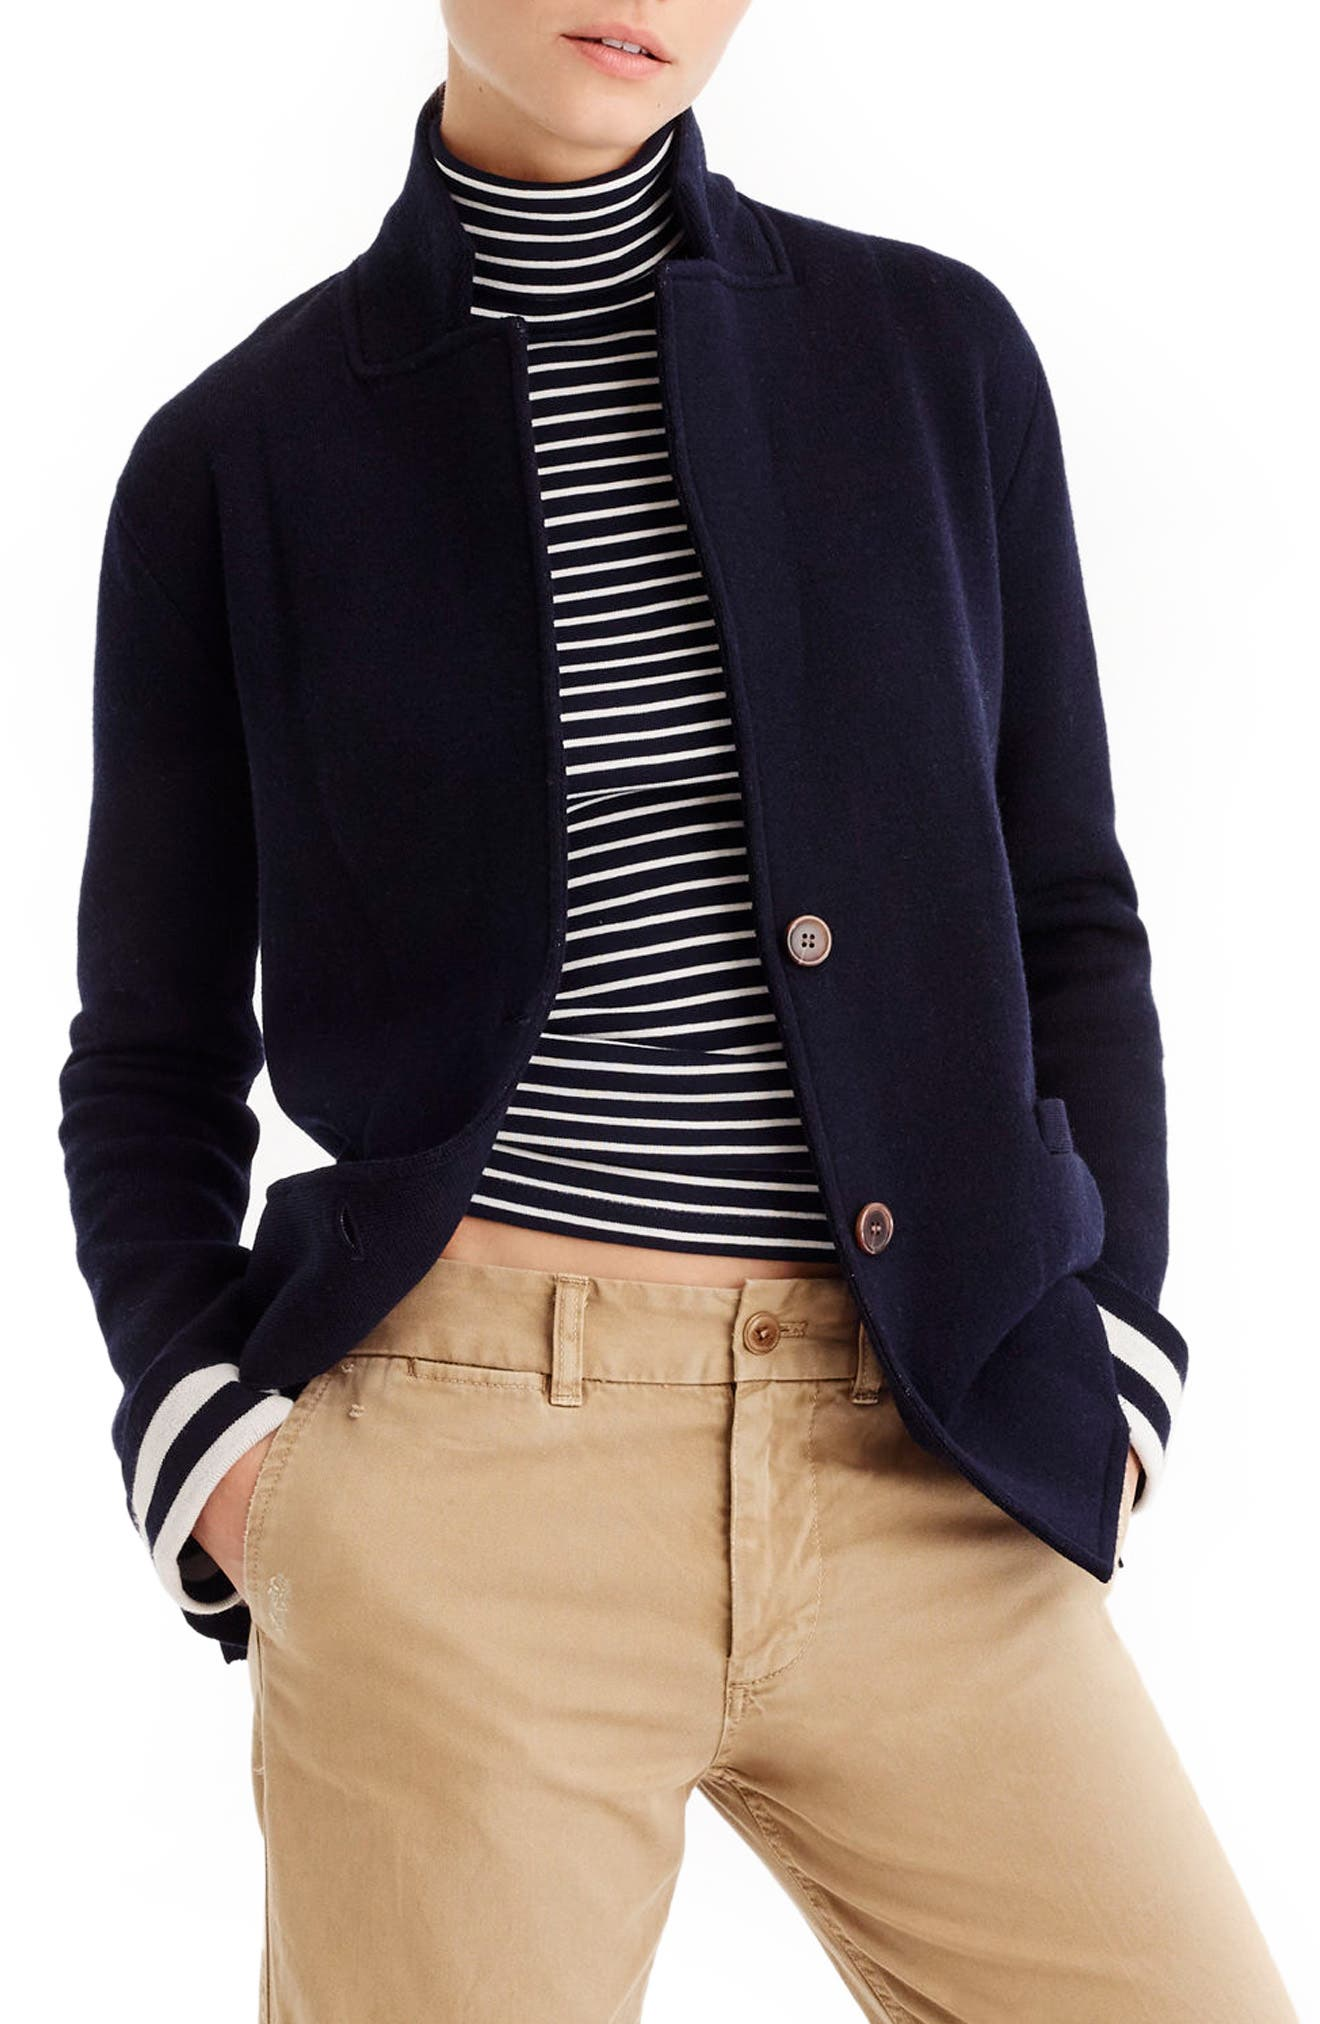 Main Image - J.Crew Stripe Lining Merino Wool Sweater Blazer